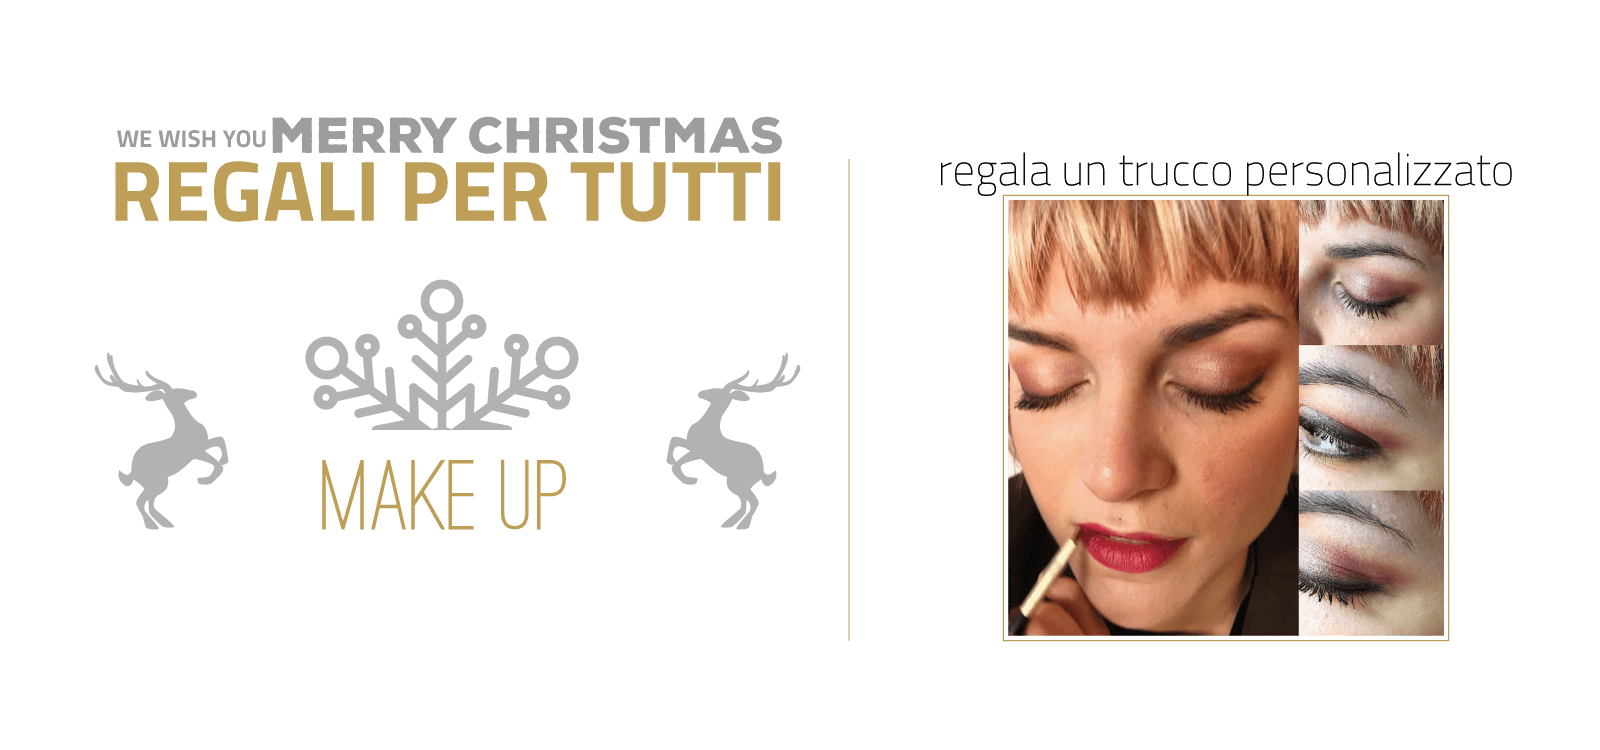 5_slide-show-regali-Natale-2018